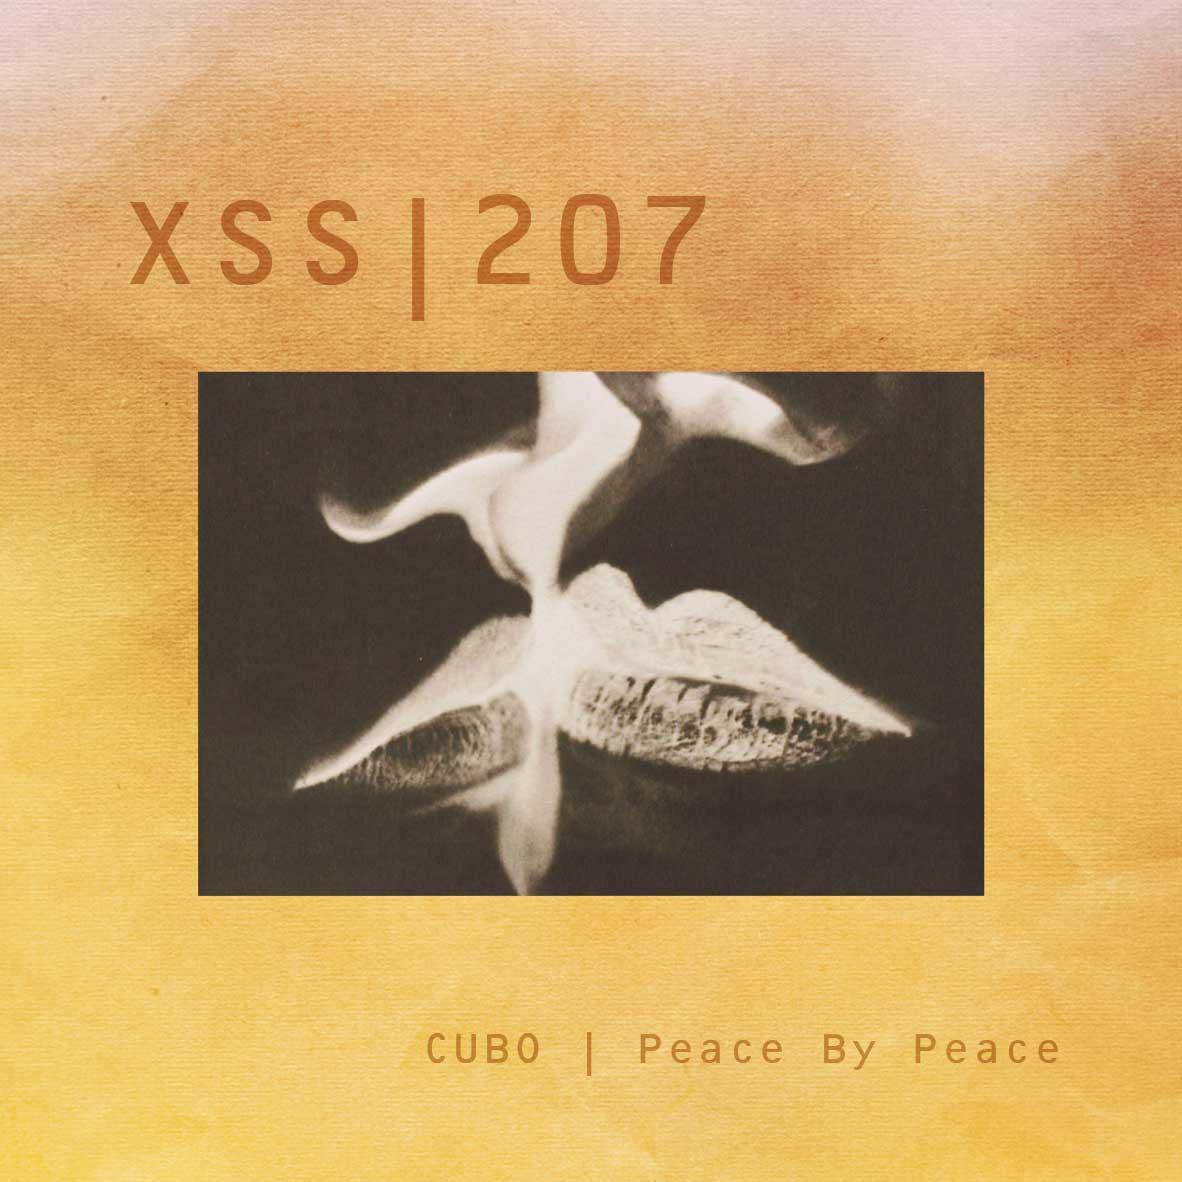 XSS207 | Cubo | Peace By Peace